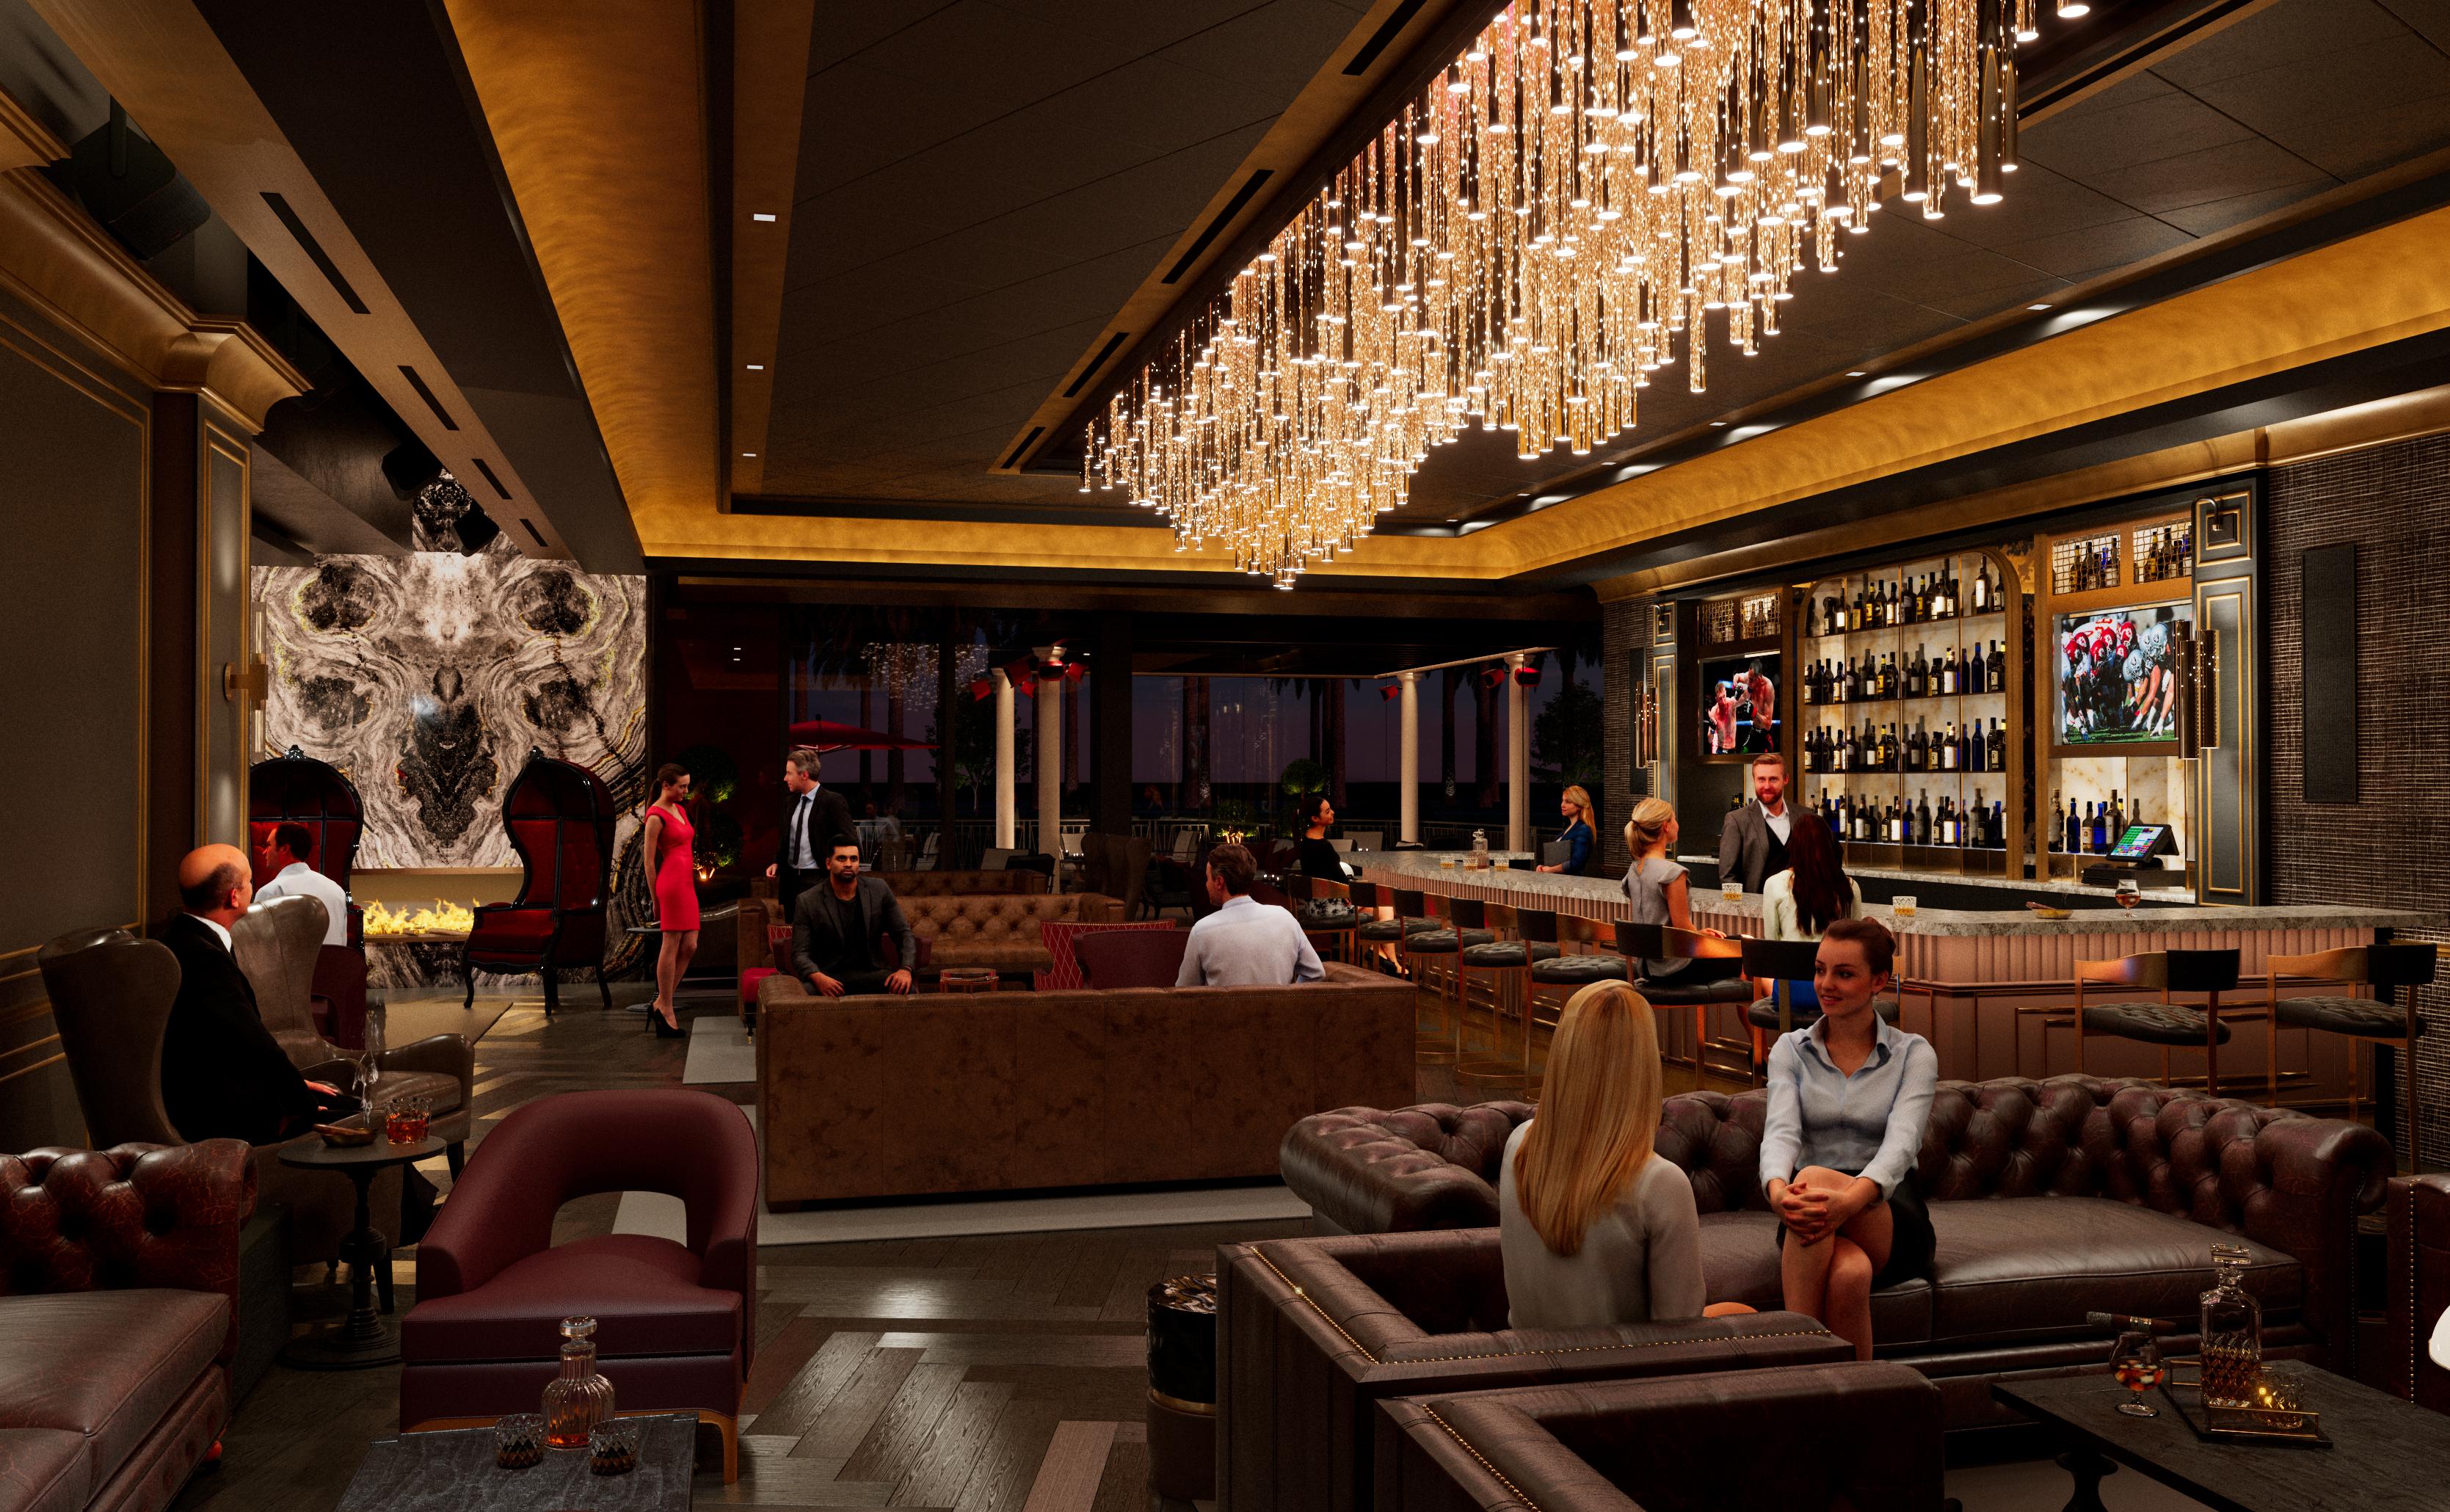 A rendering of a lounge inside a cigar bar